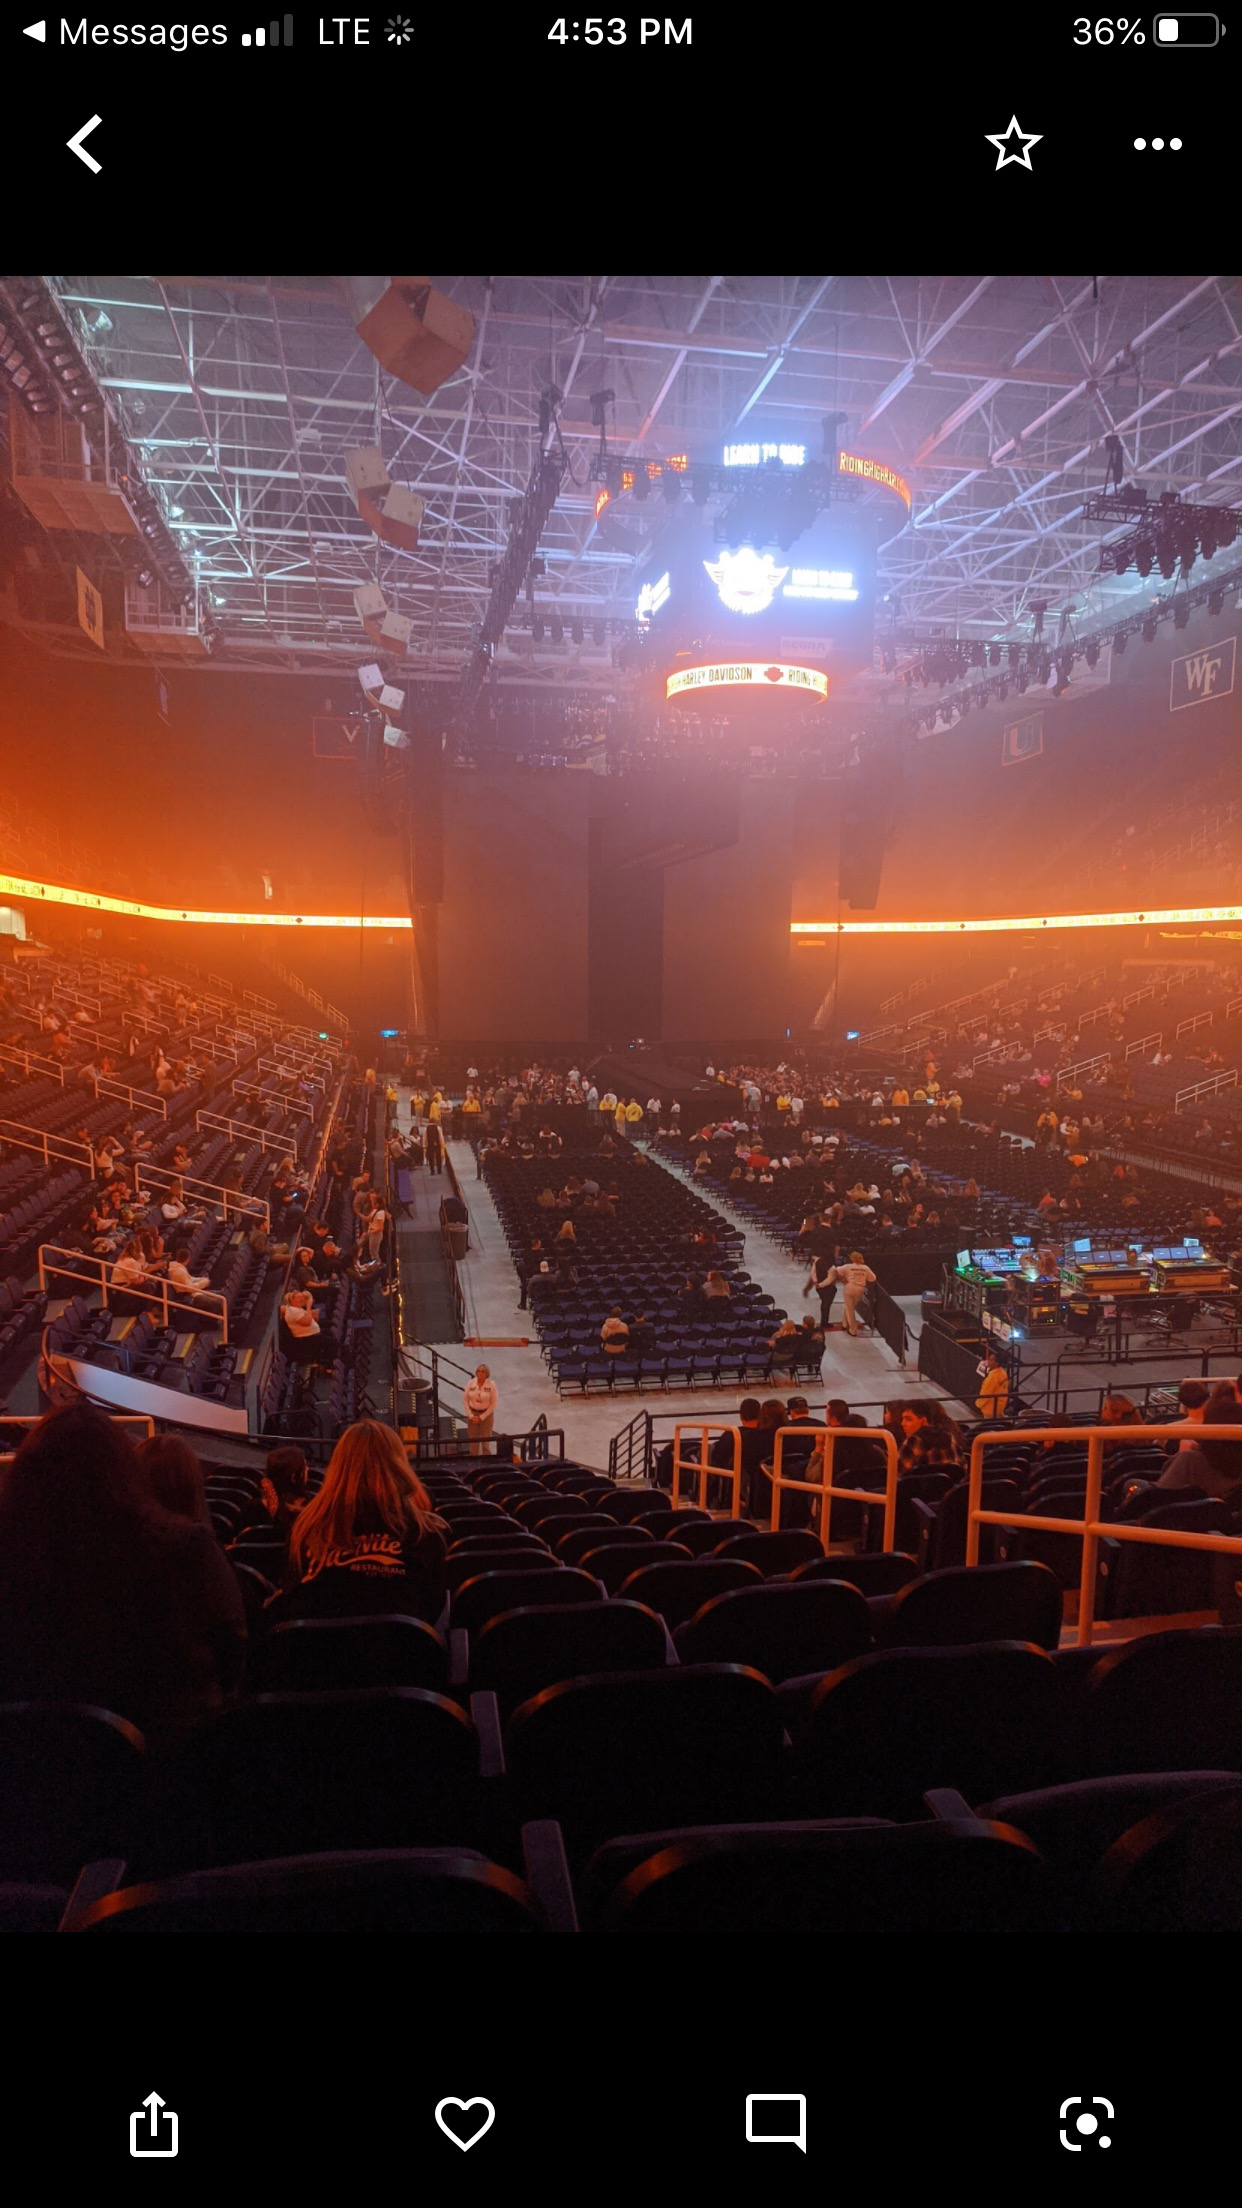 Greensboro Coliseum Section 115 Row SS Seat 16